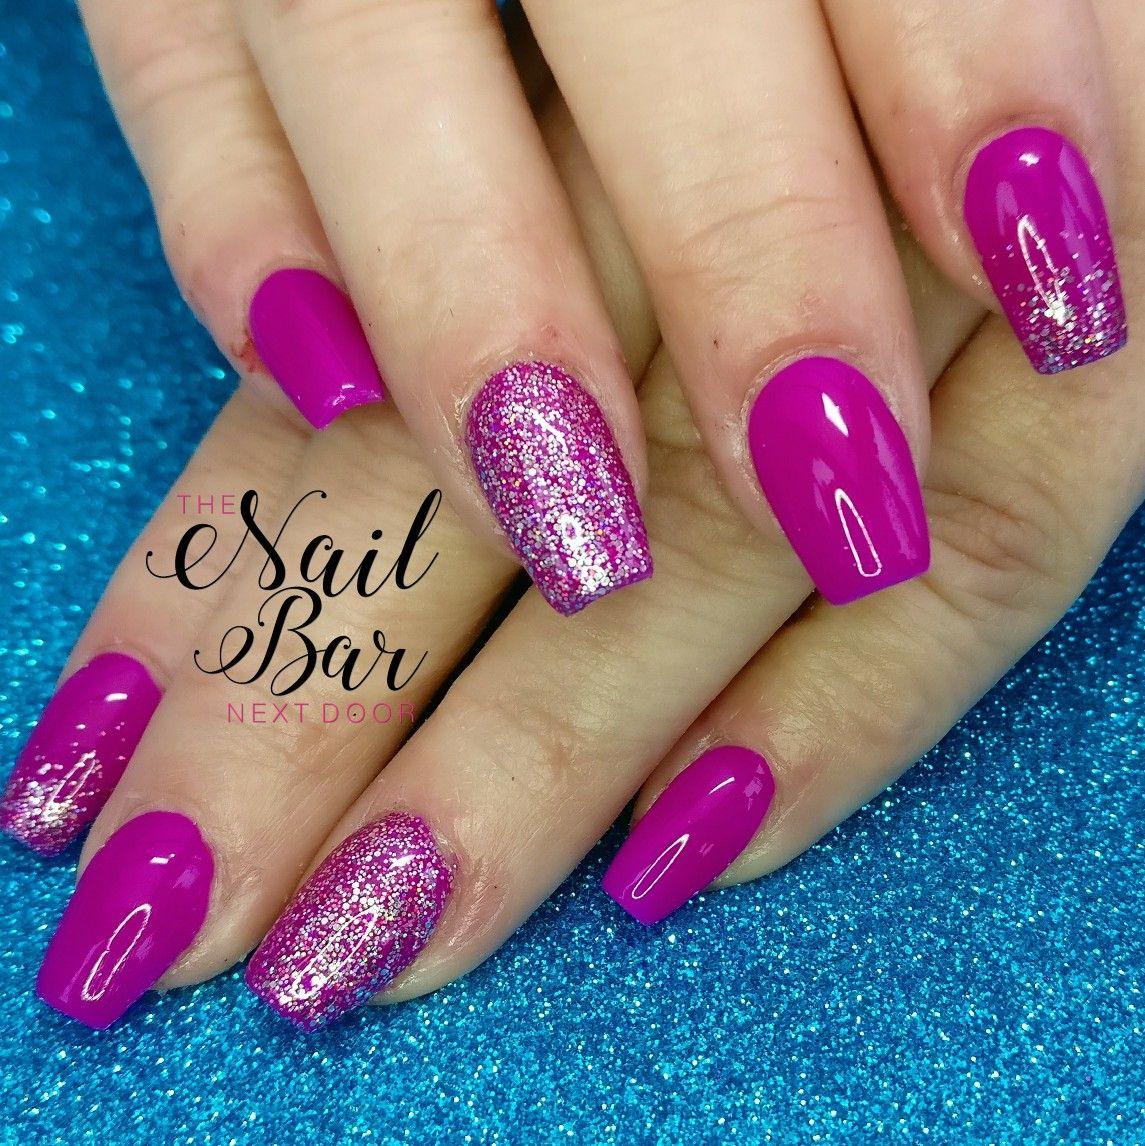 Neon fuchsia pink, coffin acrylic nails | My work | Pinterest